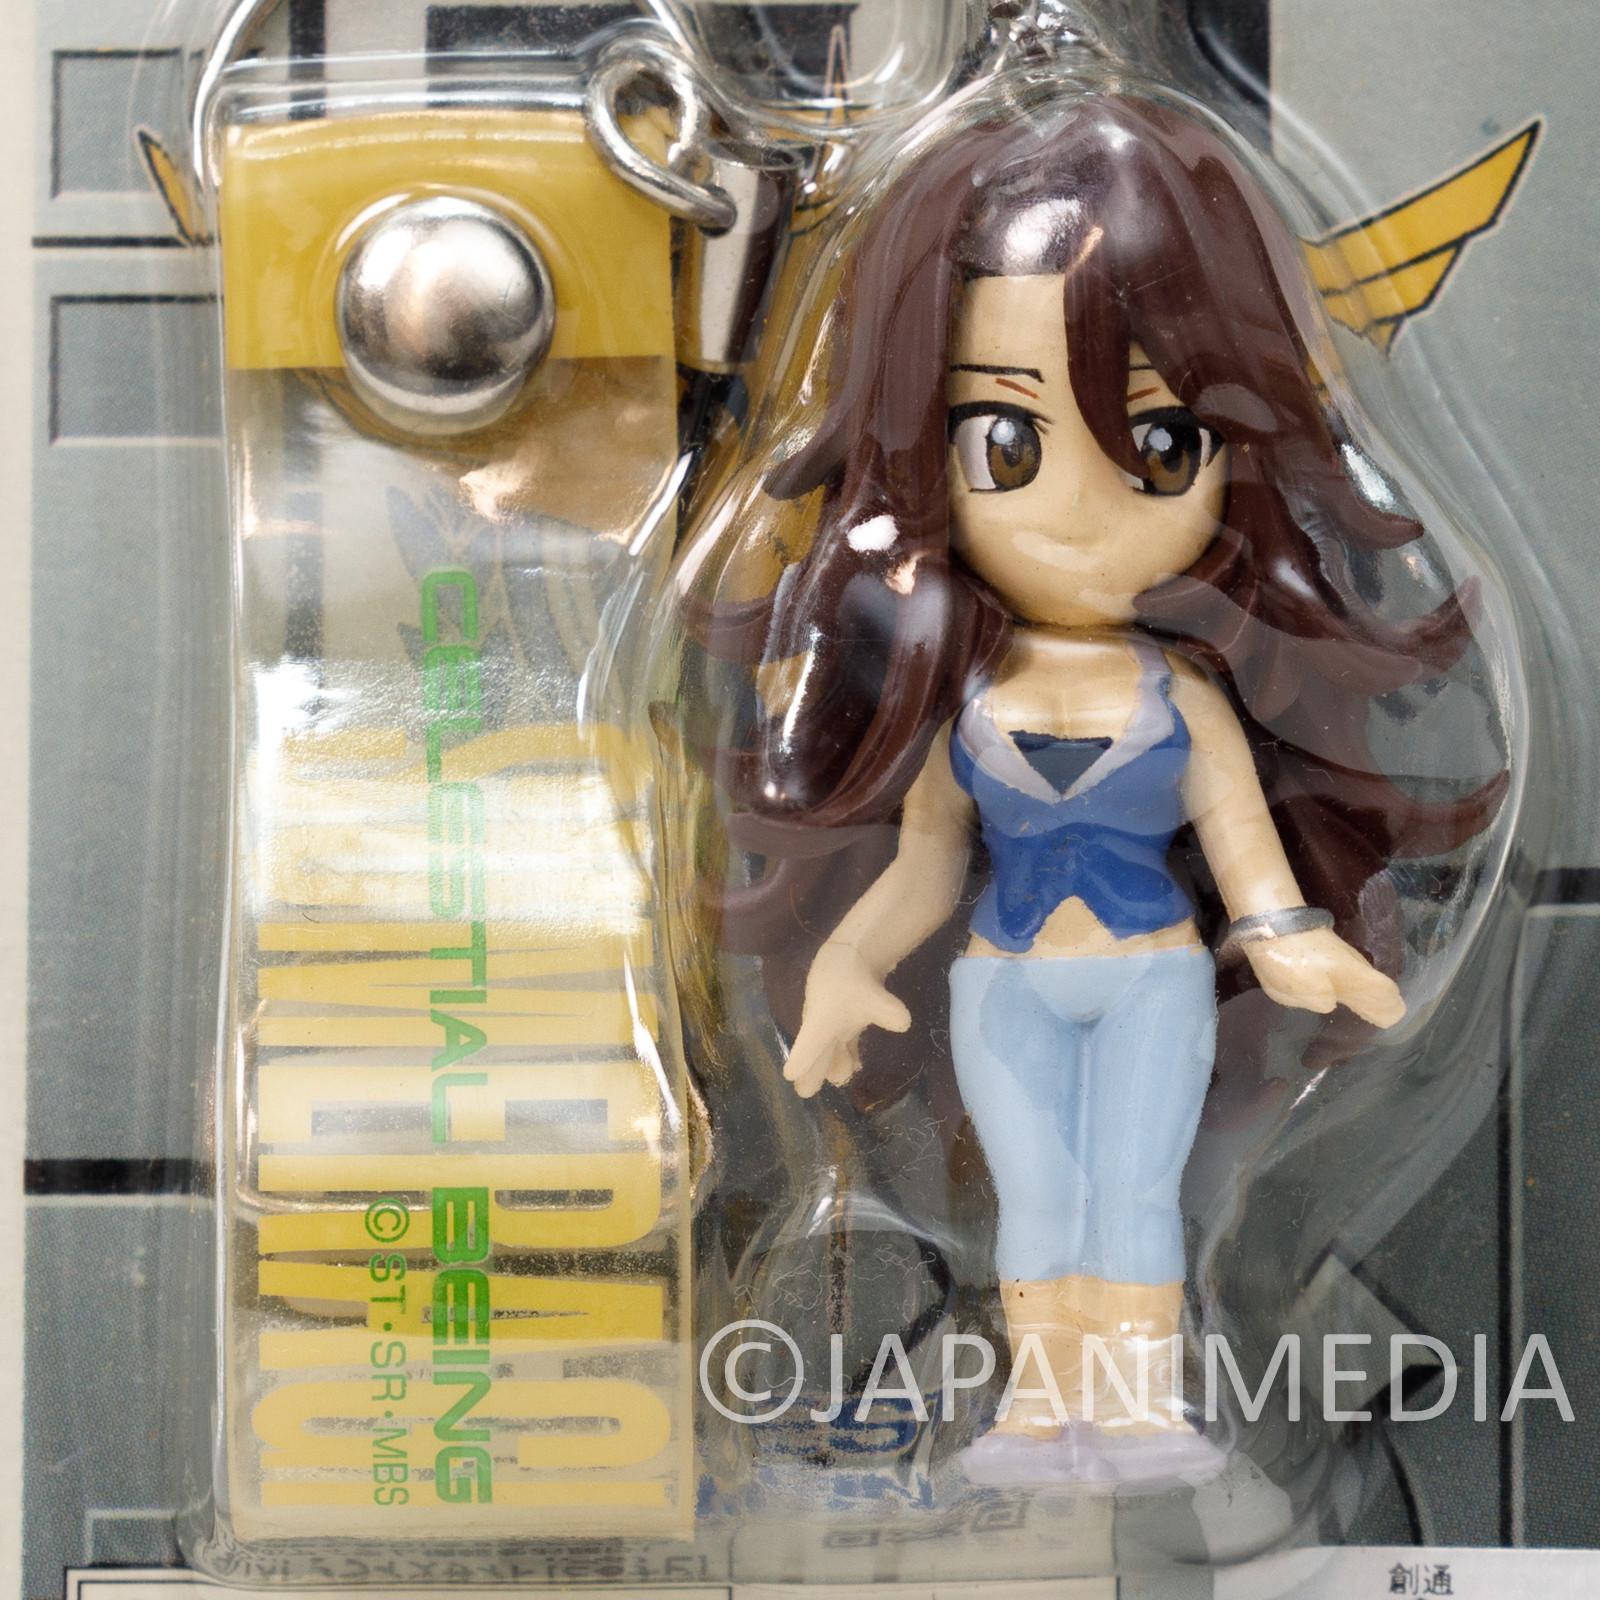 Mobile Suit Gundam 00 Sumeragi Lee Noriega Figure Strap Banpresto JAPAN